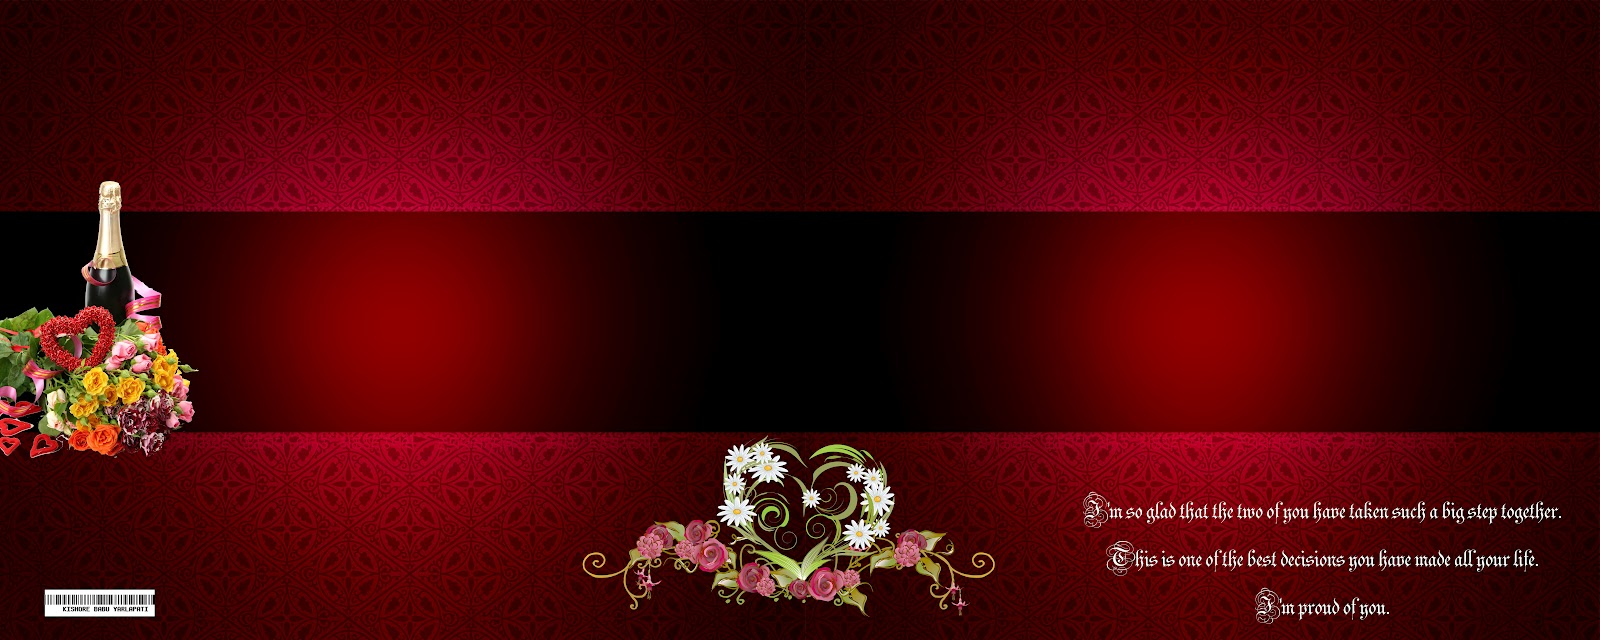 wedding card background wallpaper hd